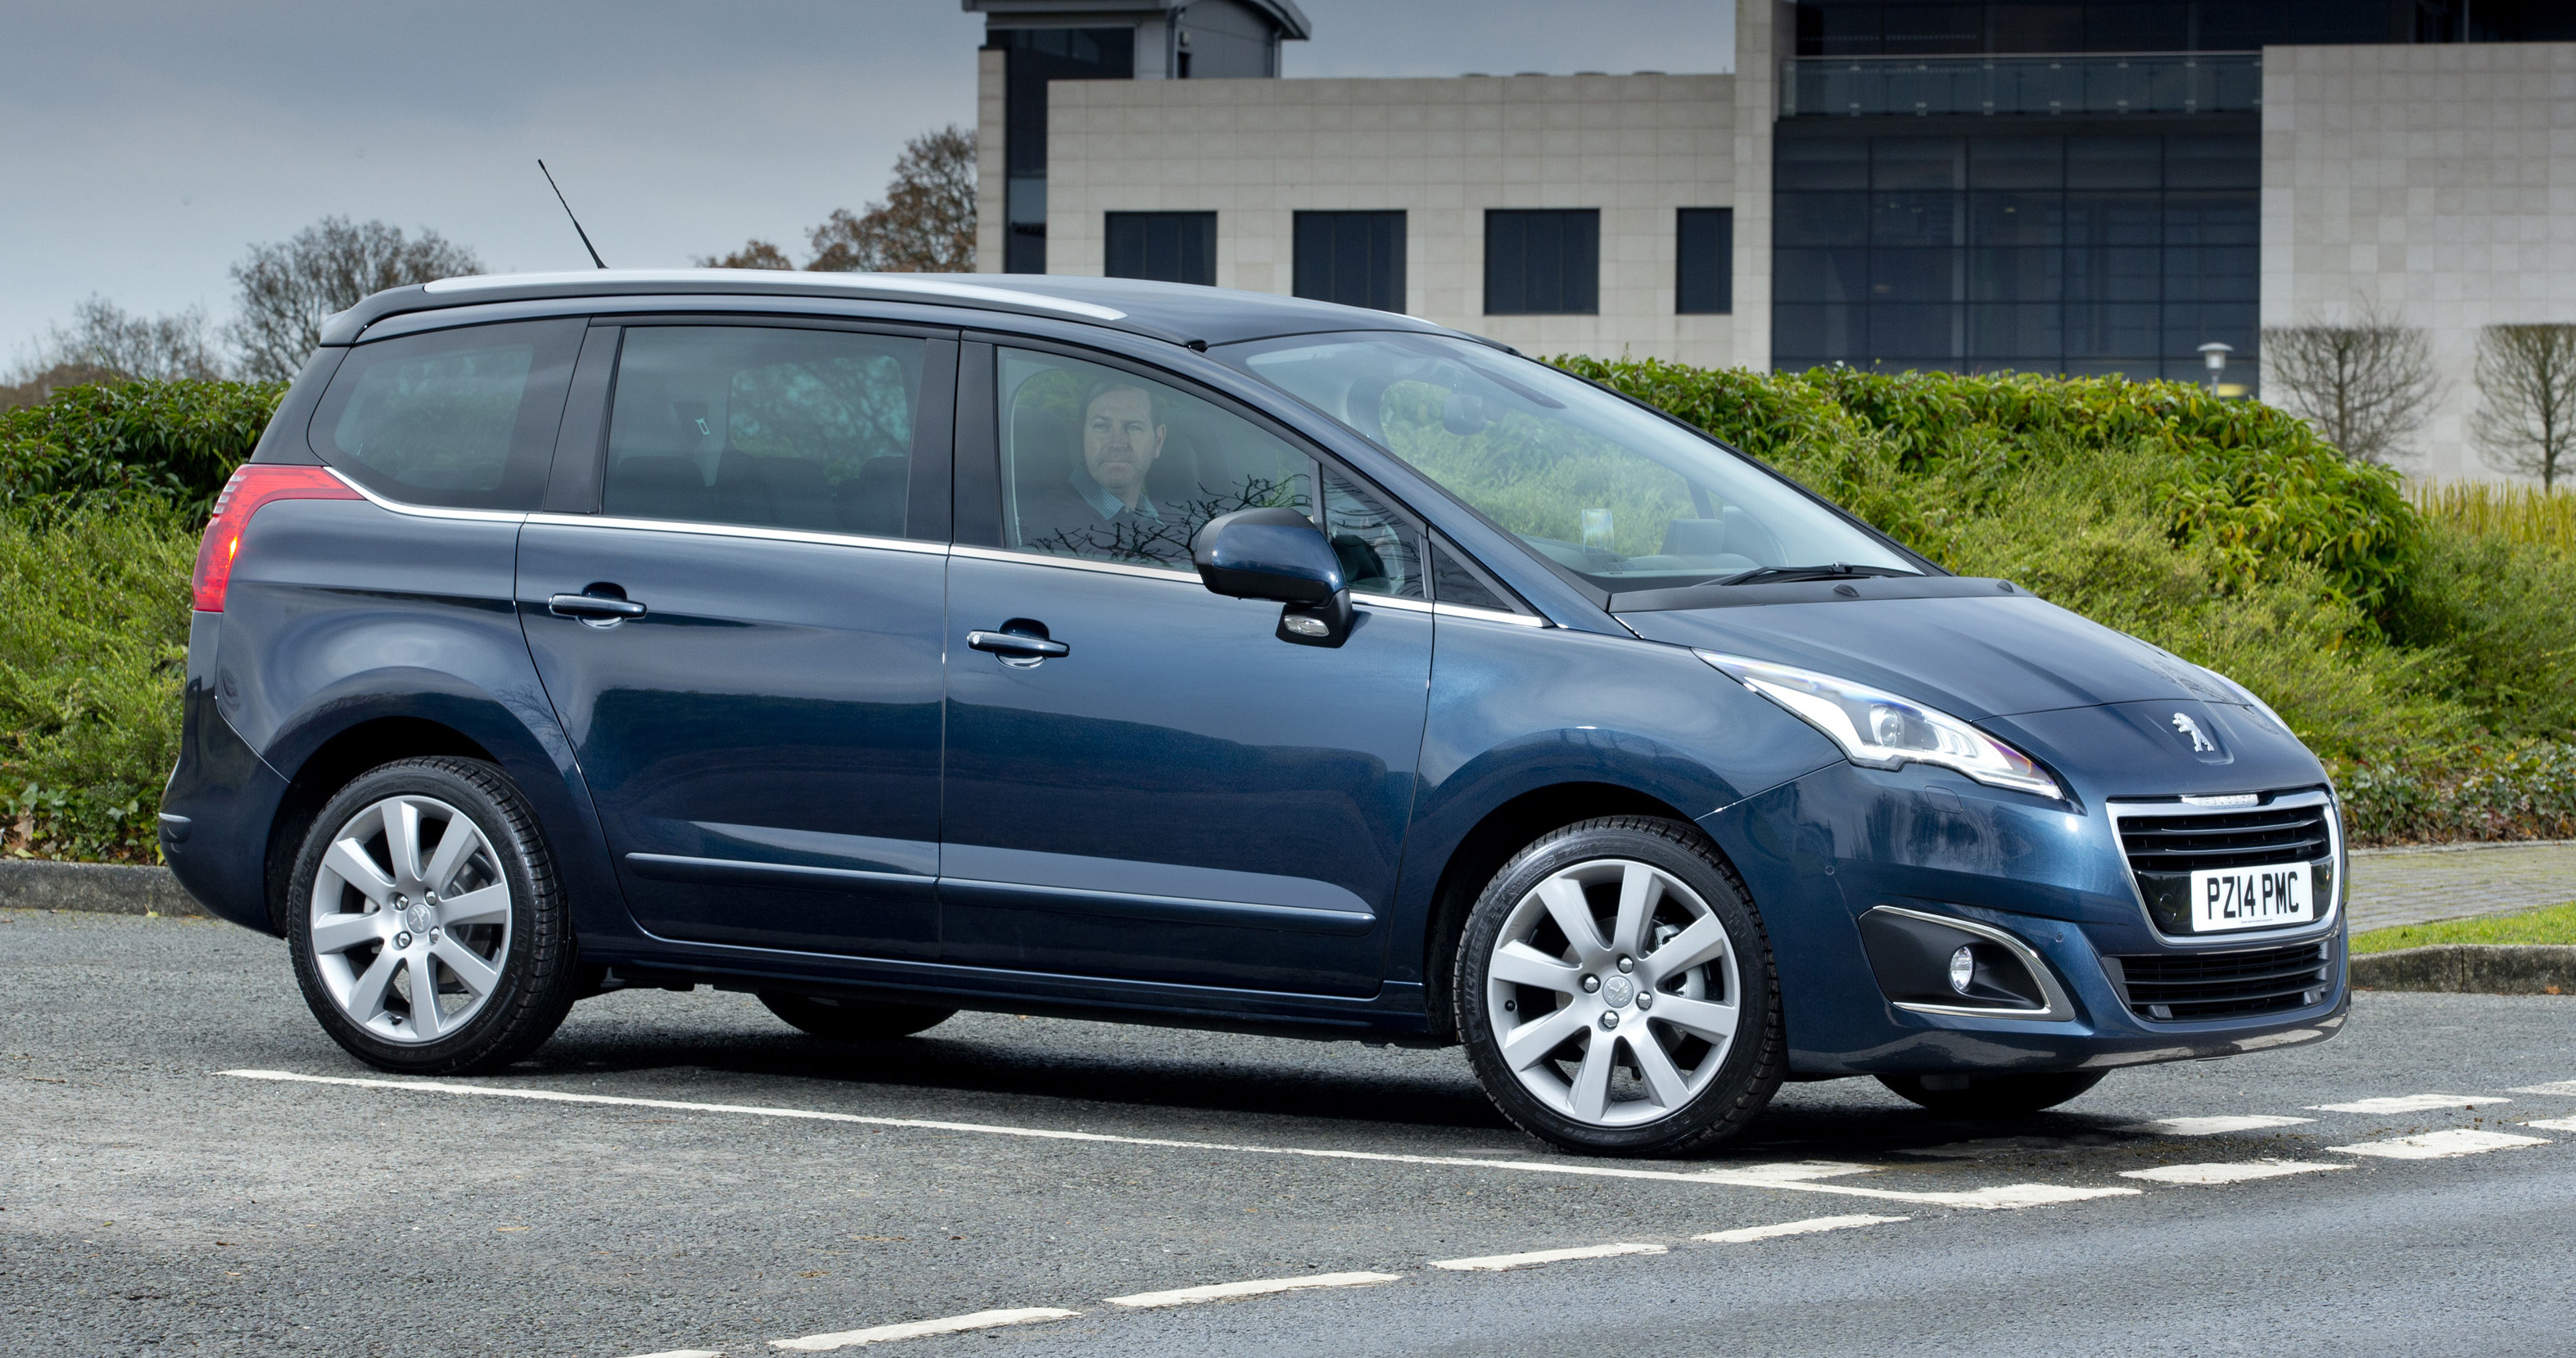 Opiniones De Peugeot 5008